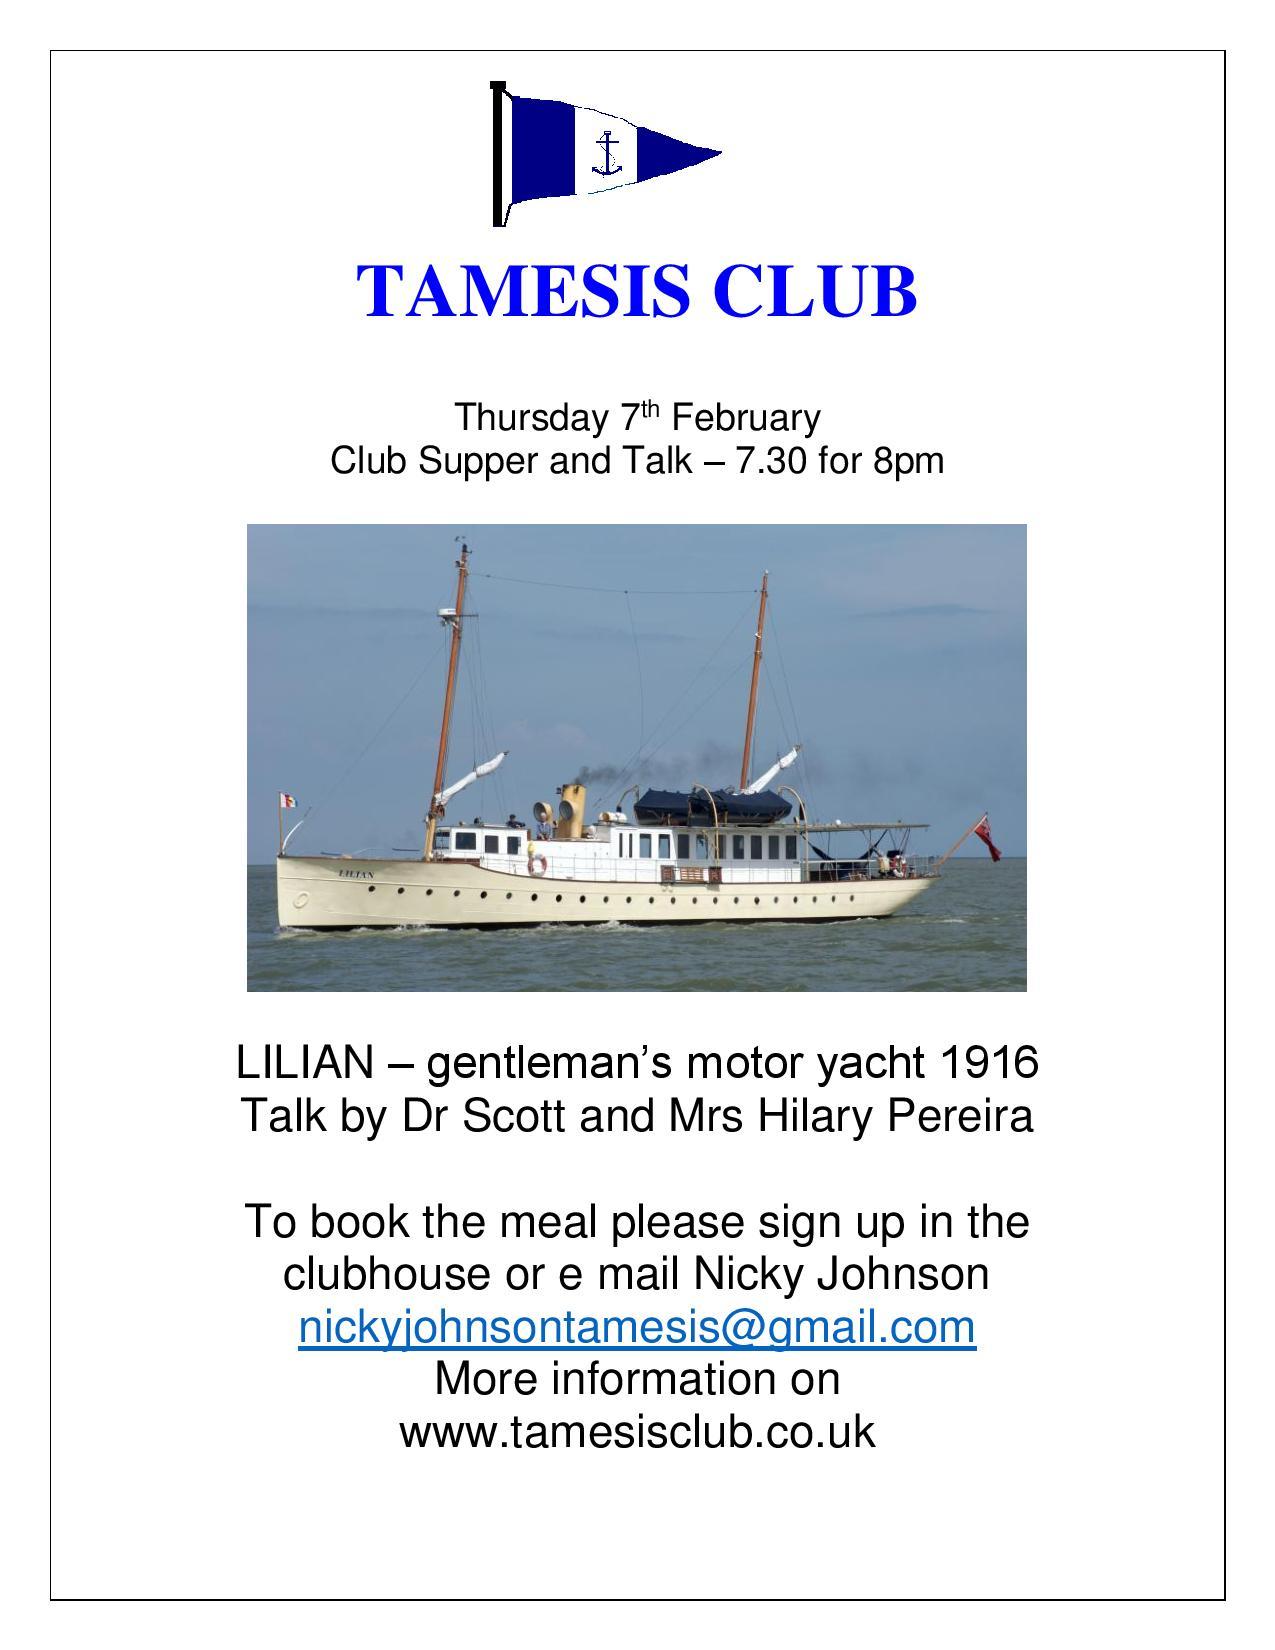 Fascinating talk on Yacht Lilian